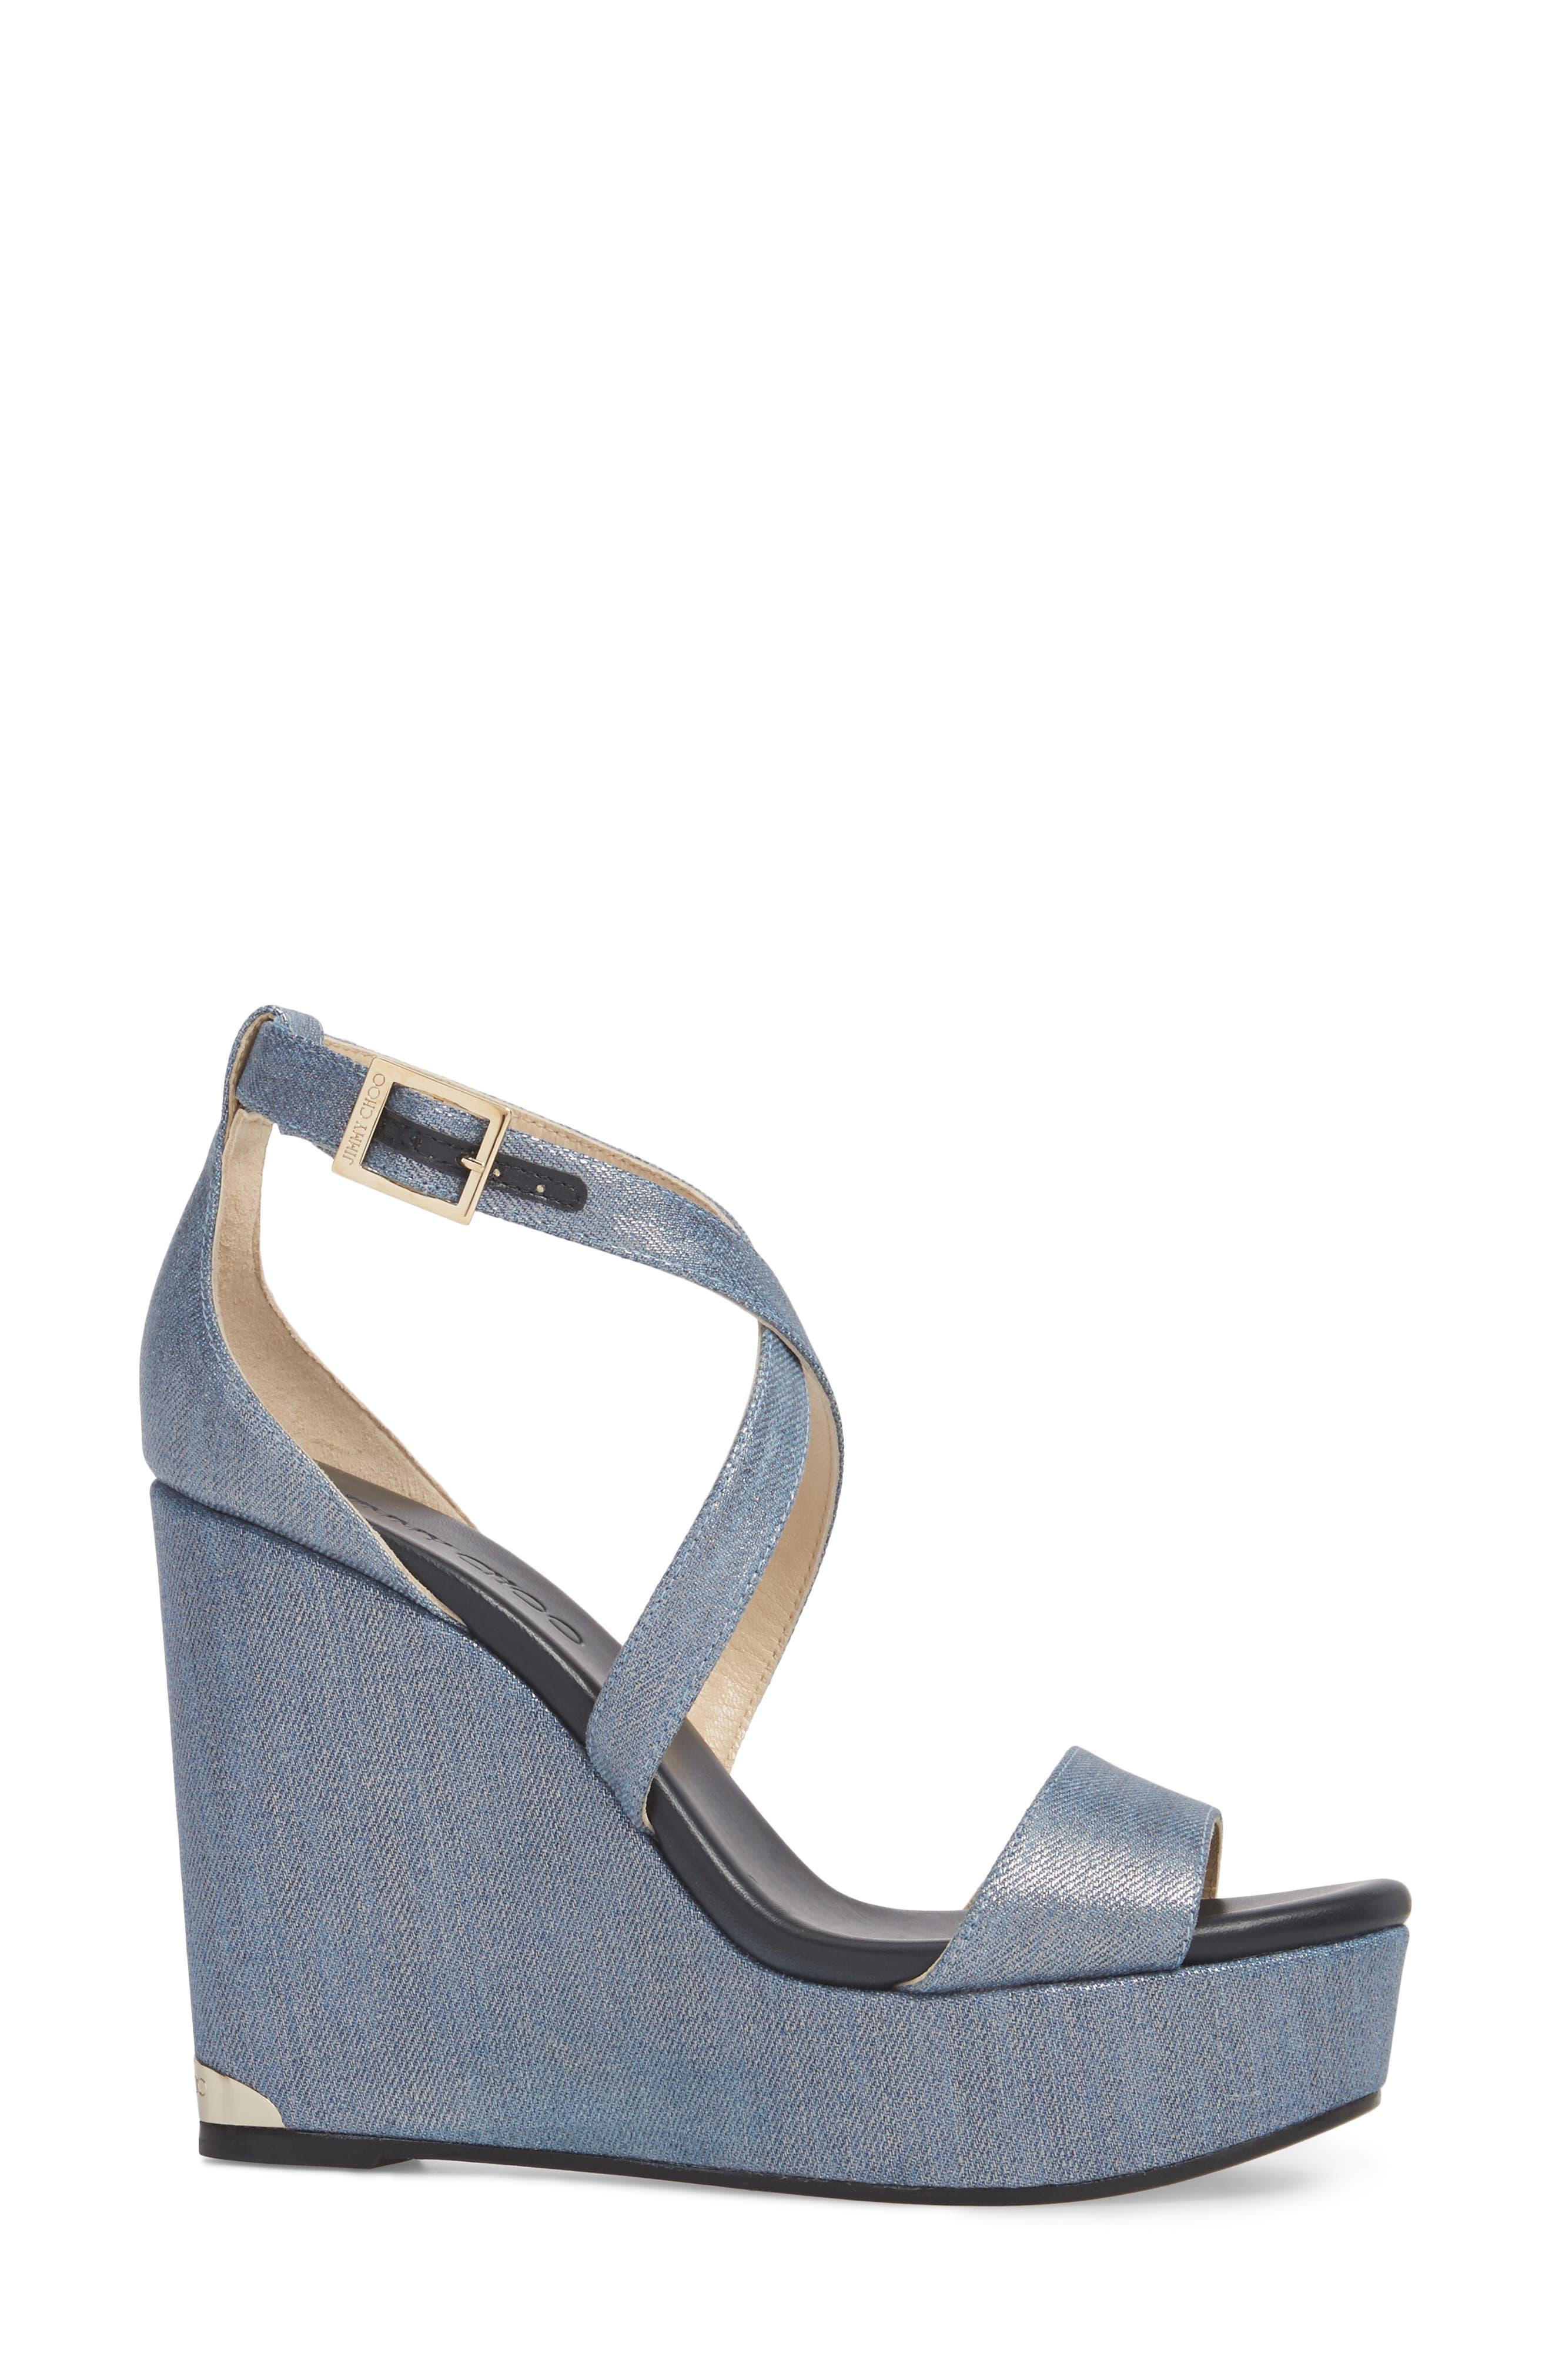 Portia Platform Wedge Sandal,                             Alternate thumbnail 3, color,                             Dusk Blue